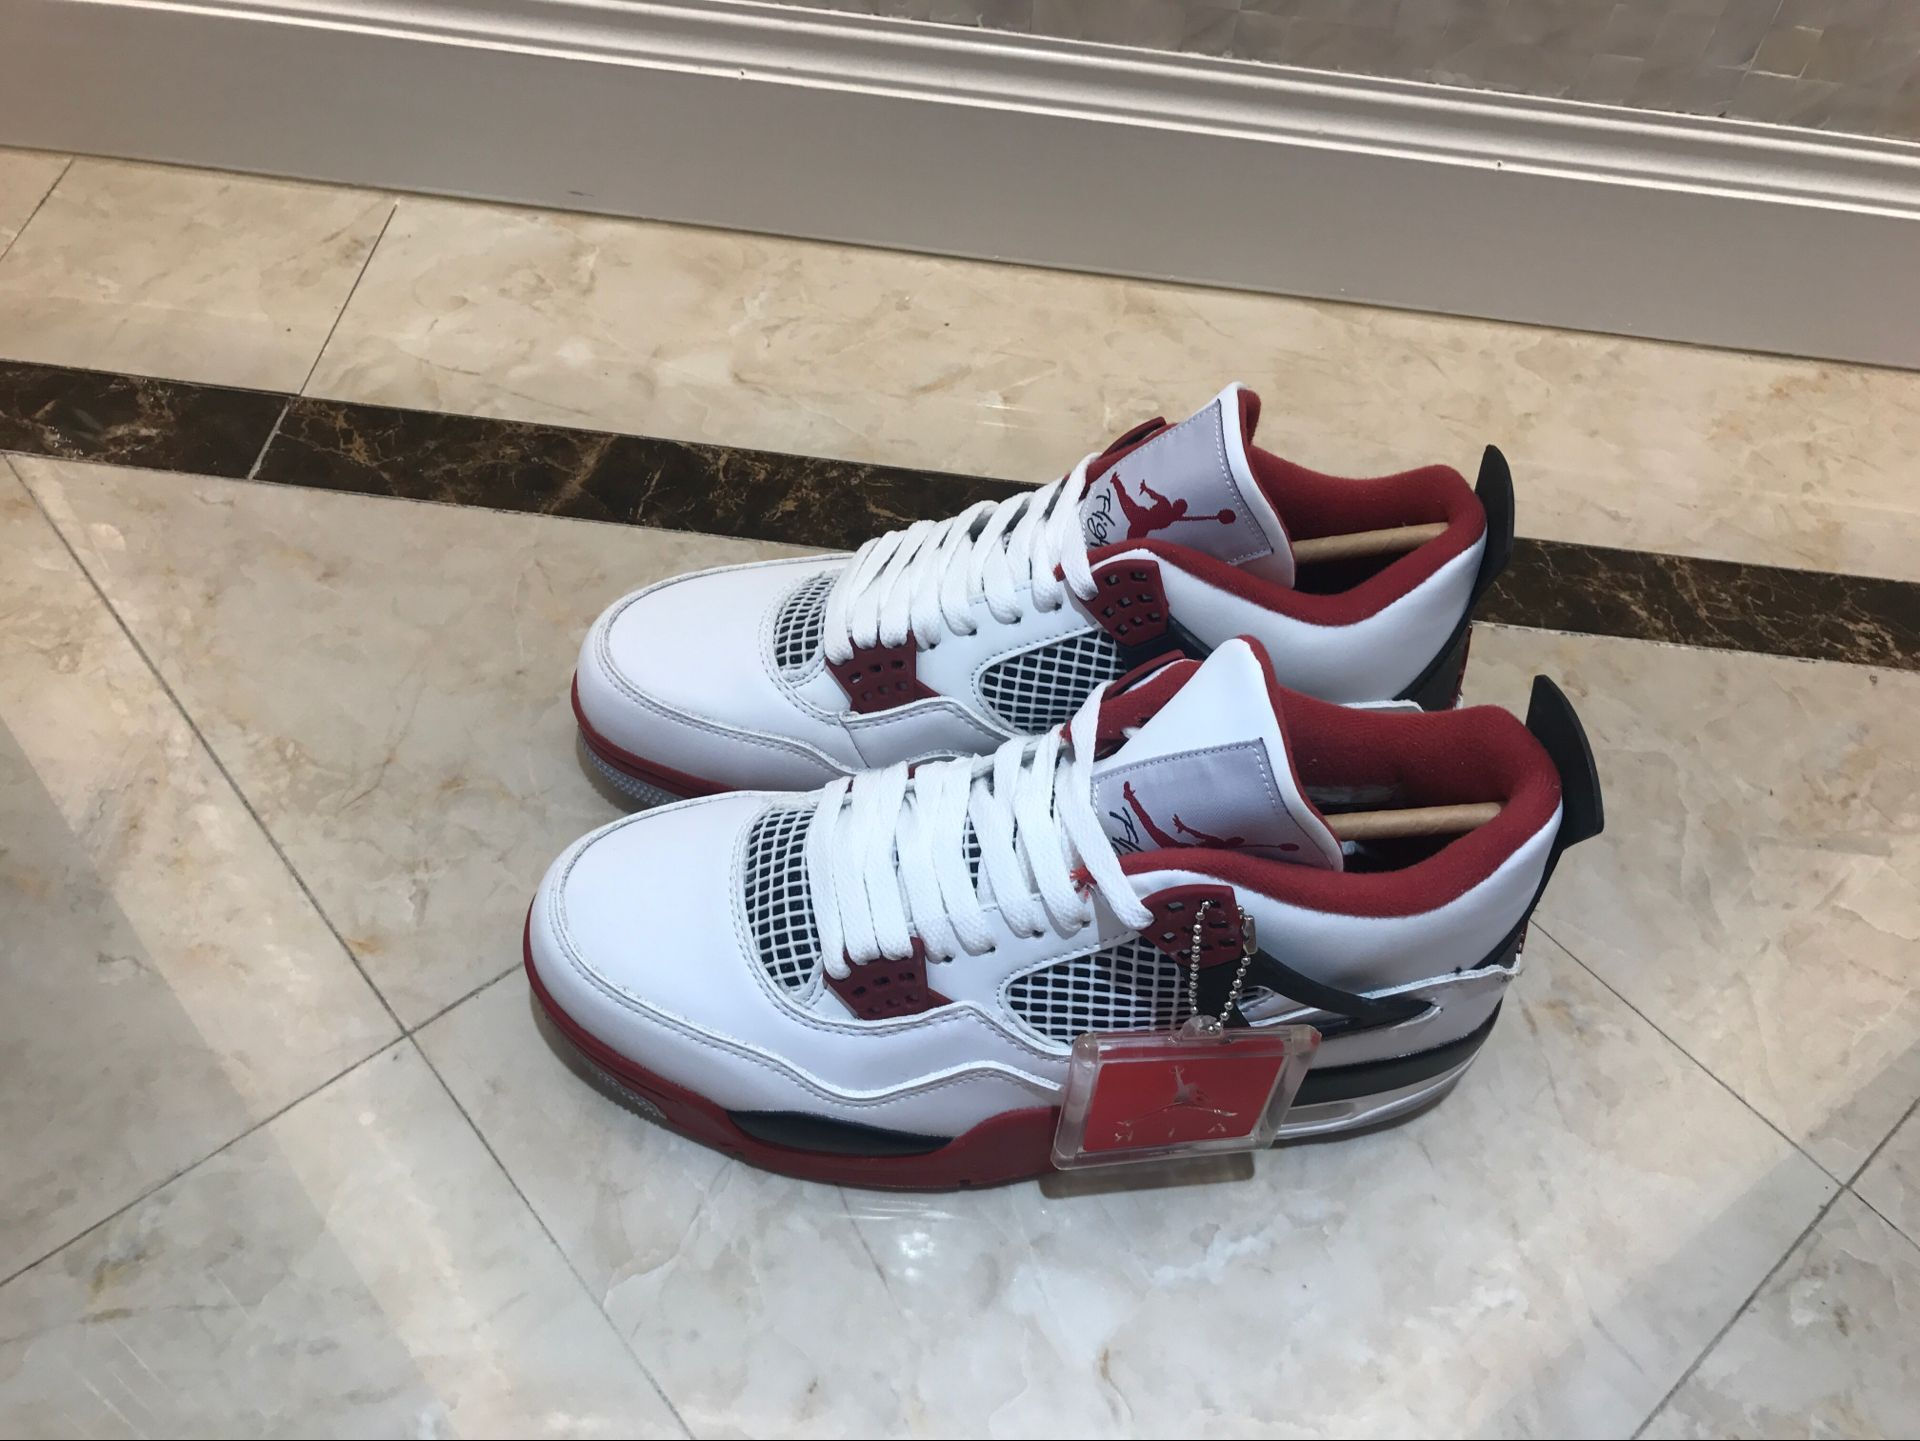 reputable site 6e100 dc1d5 Men Air Jordan 4 Retro White Wine Red Black [18women72202] - $93.00 ...